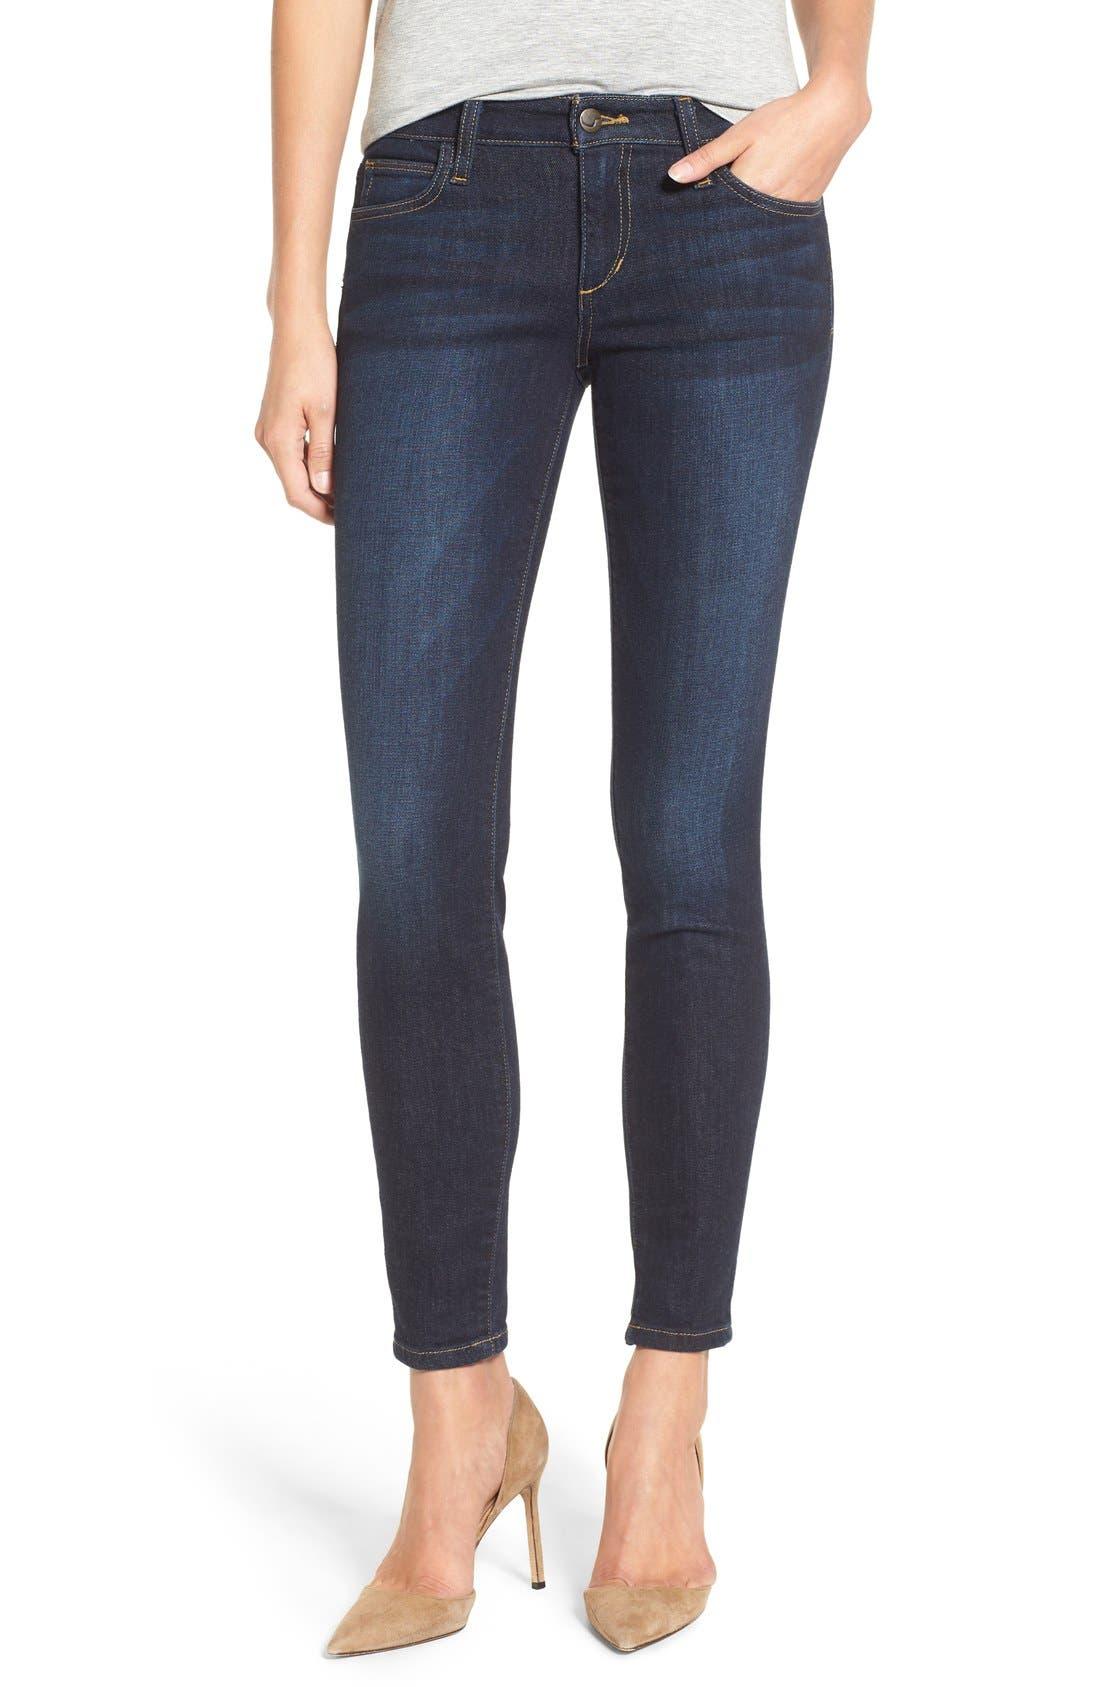 Alternate Image 1 Selected - Joe's Ankle Skinny Jeans (Rikki)